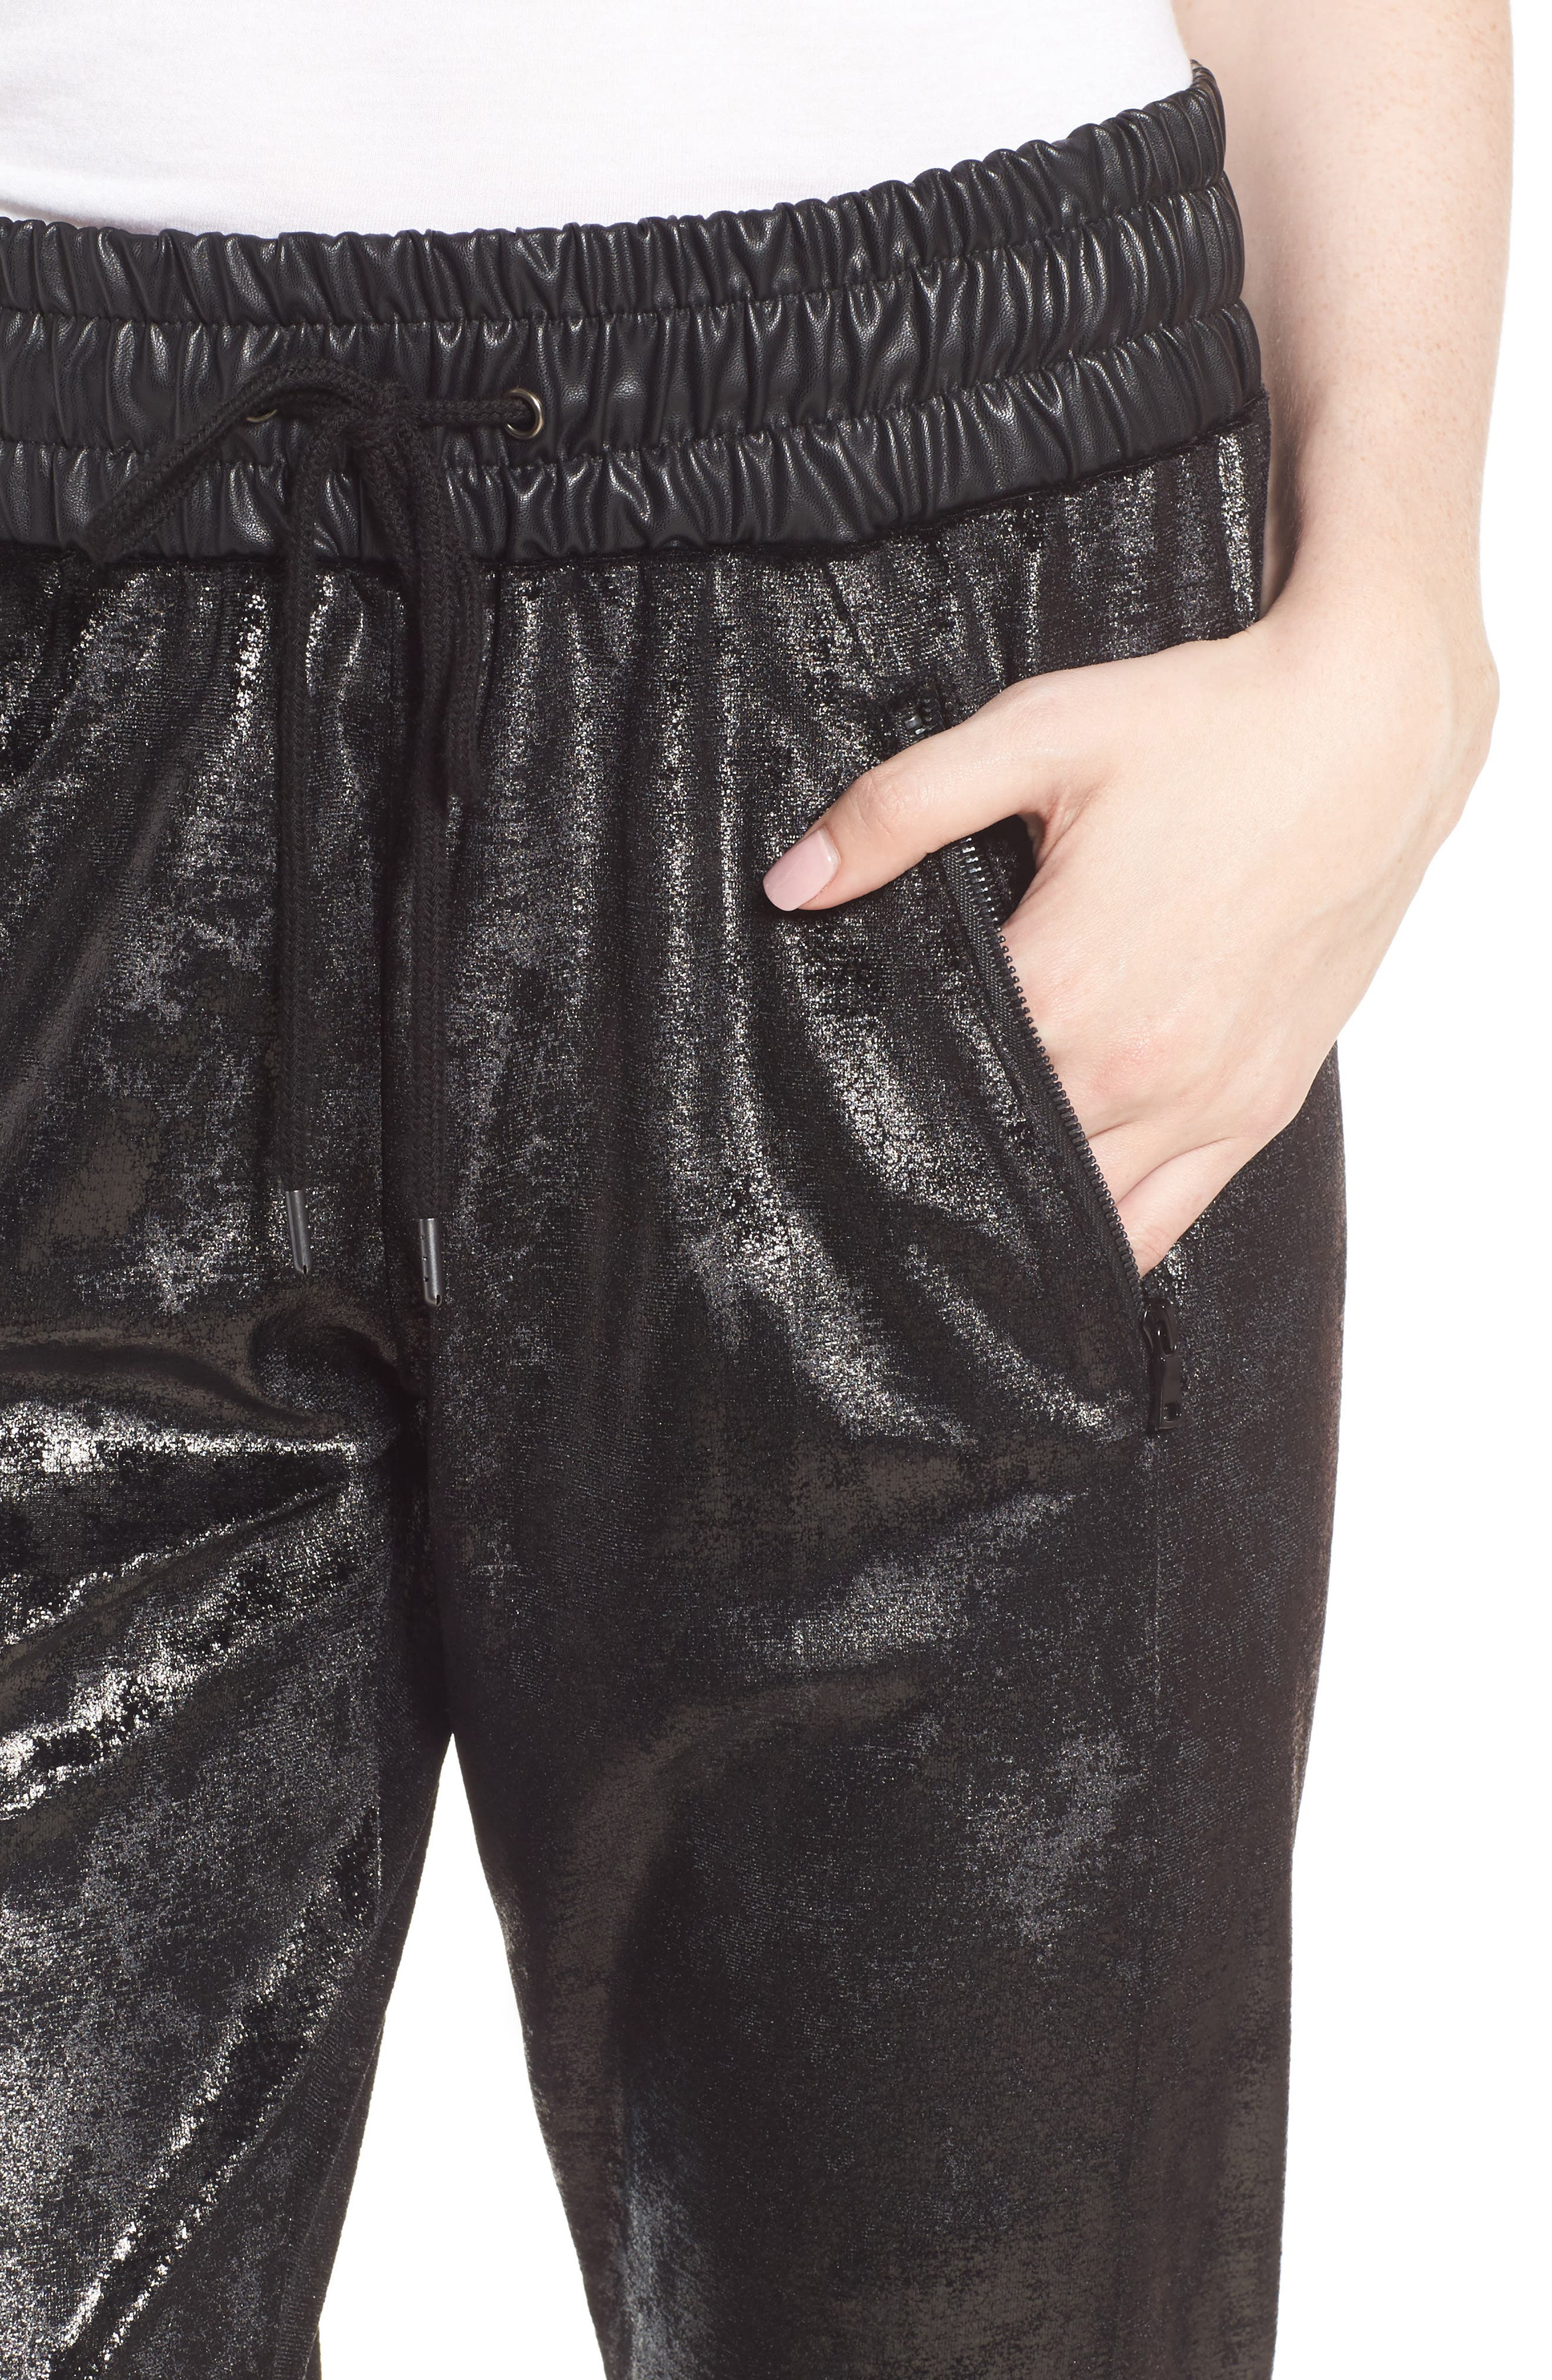 Randall Cuffed Sweatpants,                             Alternate thumbnail 4, color,                             001